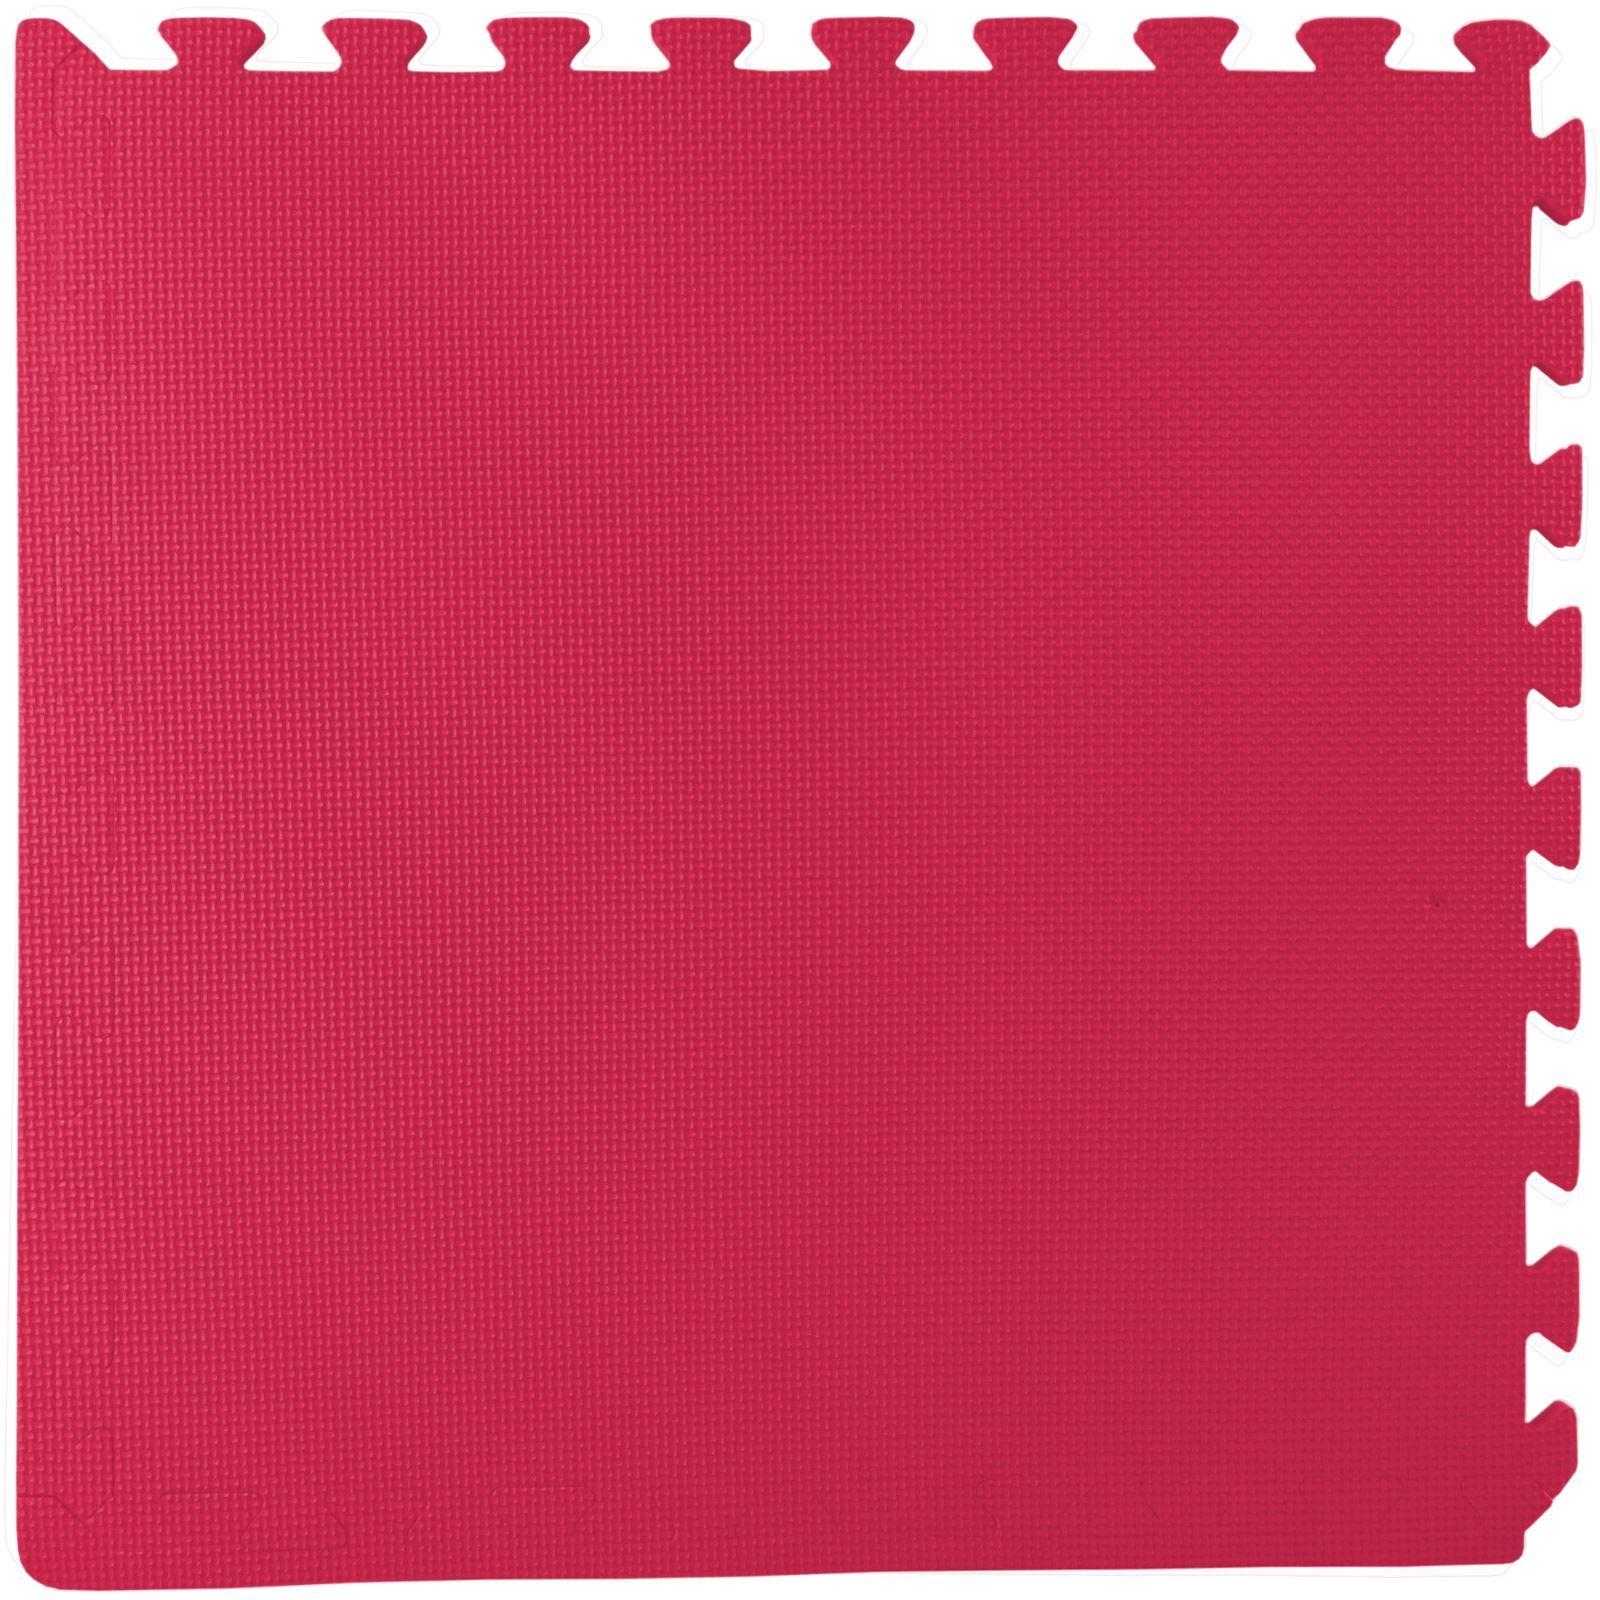 puzzle goods sporting floor mats mat soozier foam tile interlocking